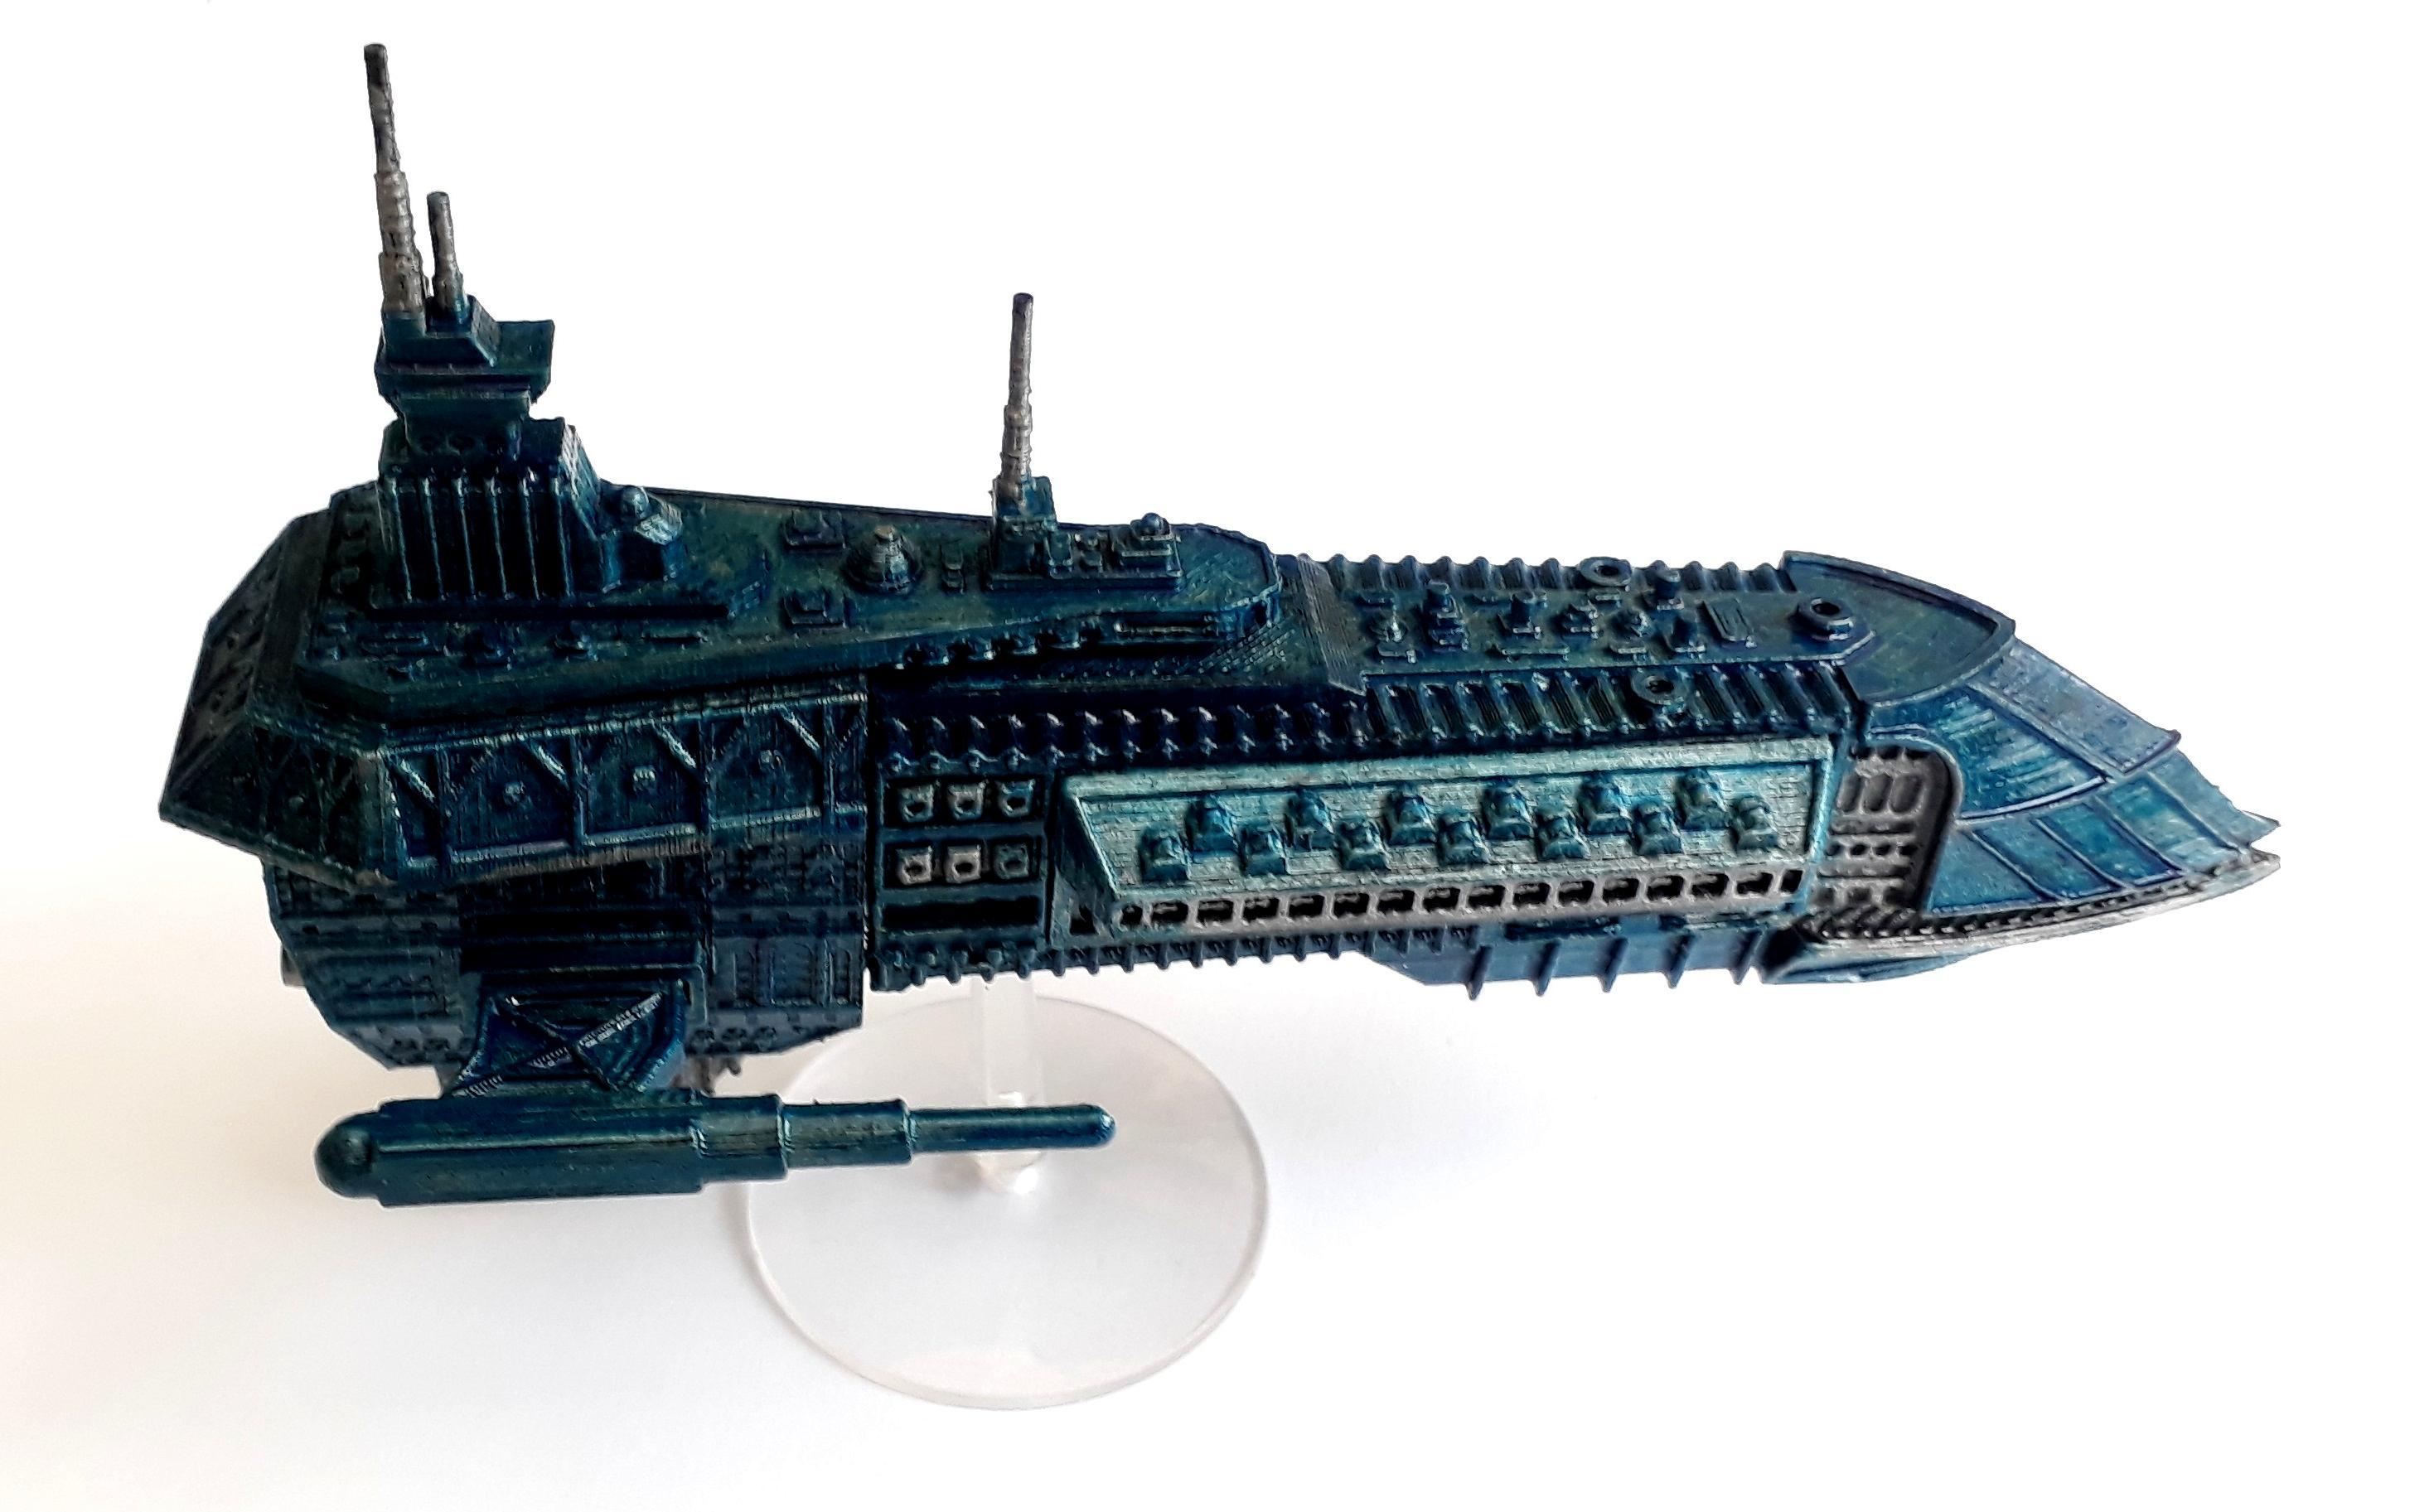 Arkhadian, Battleship, Cruiser, Grand Cruiser